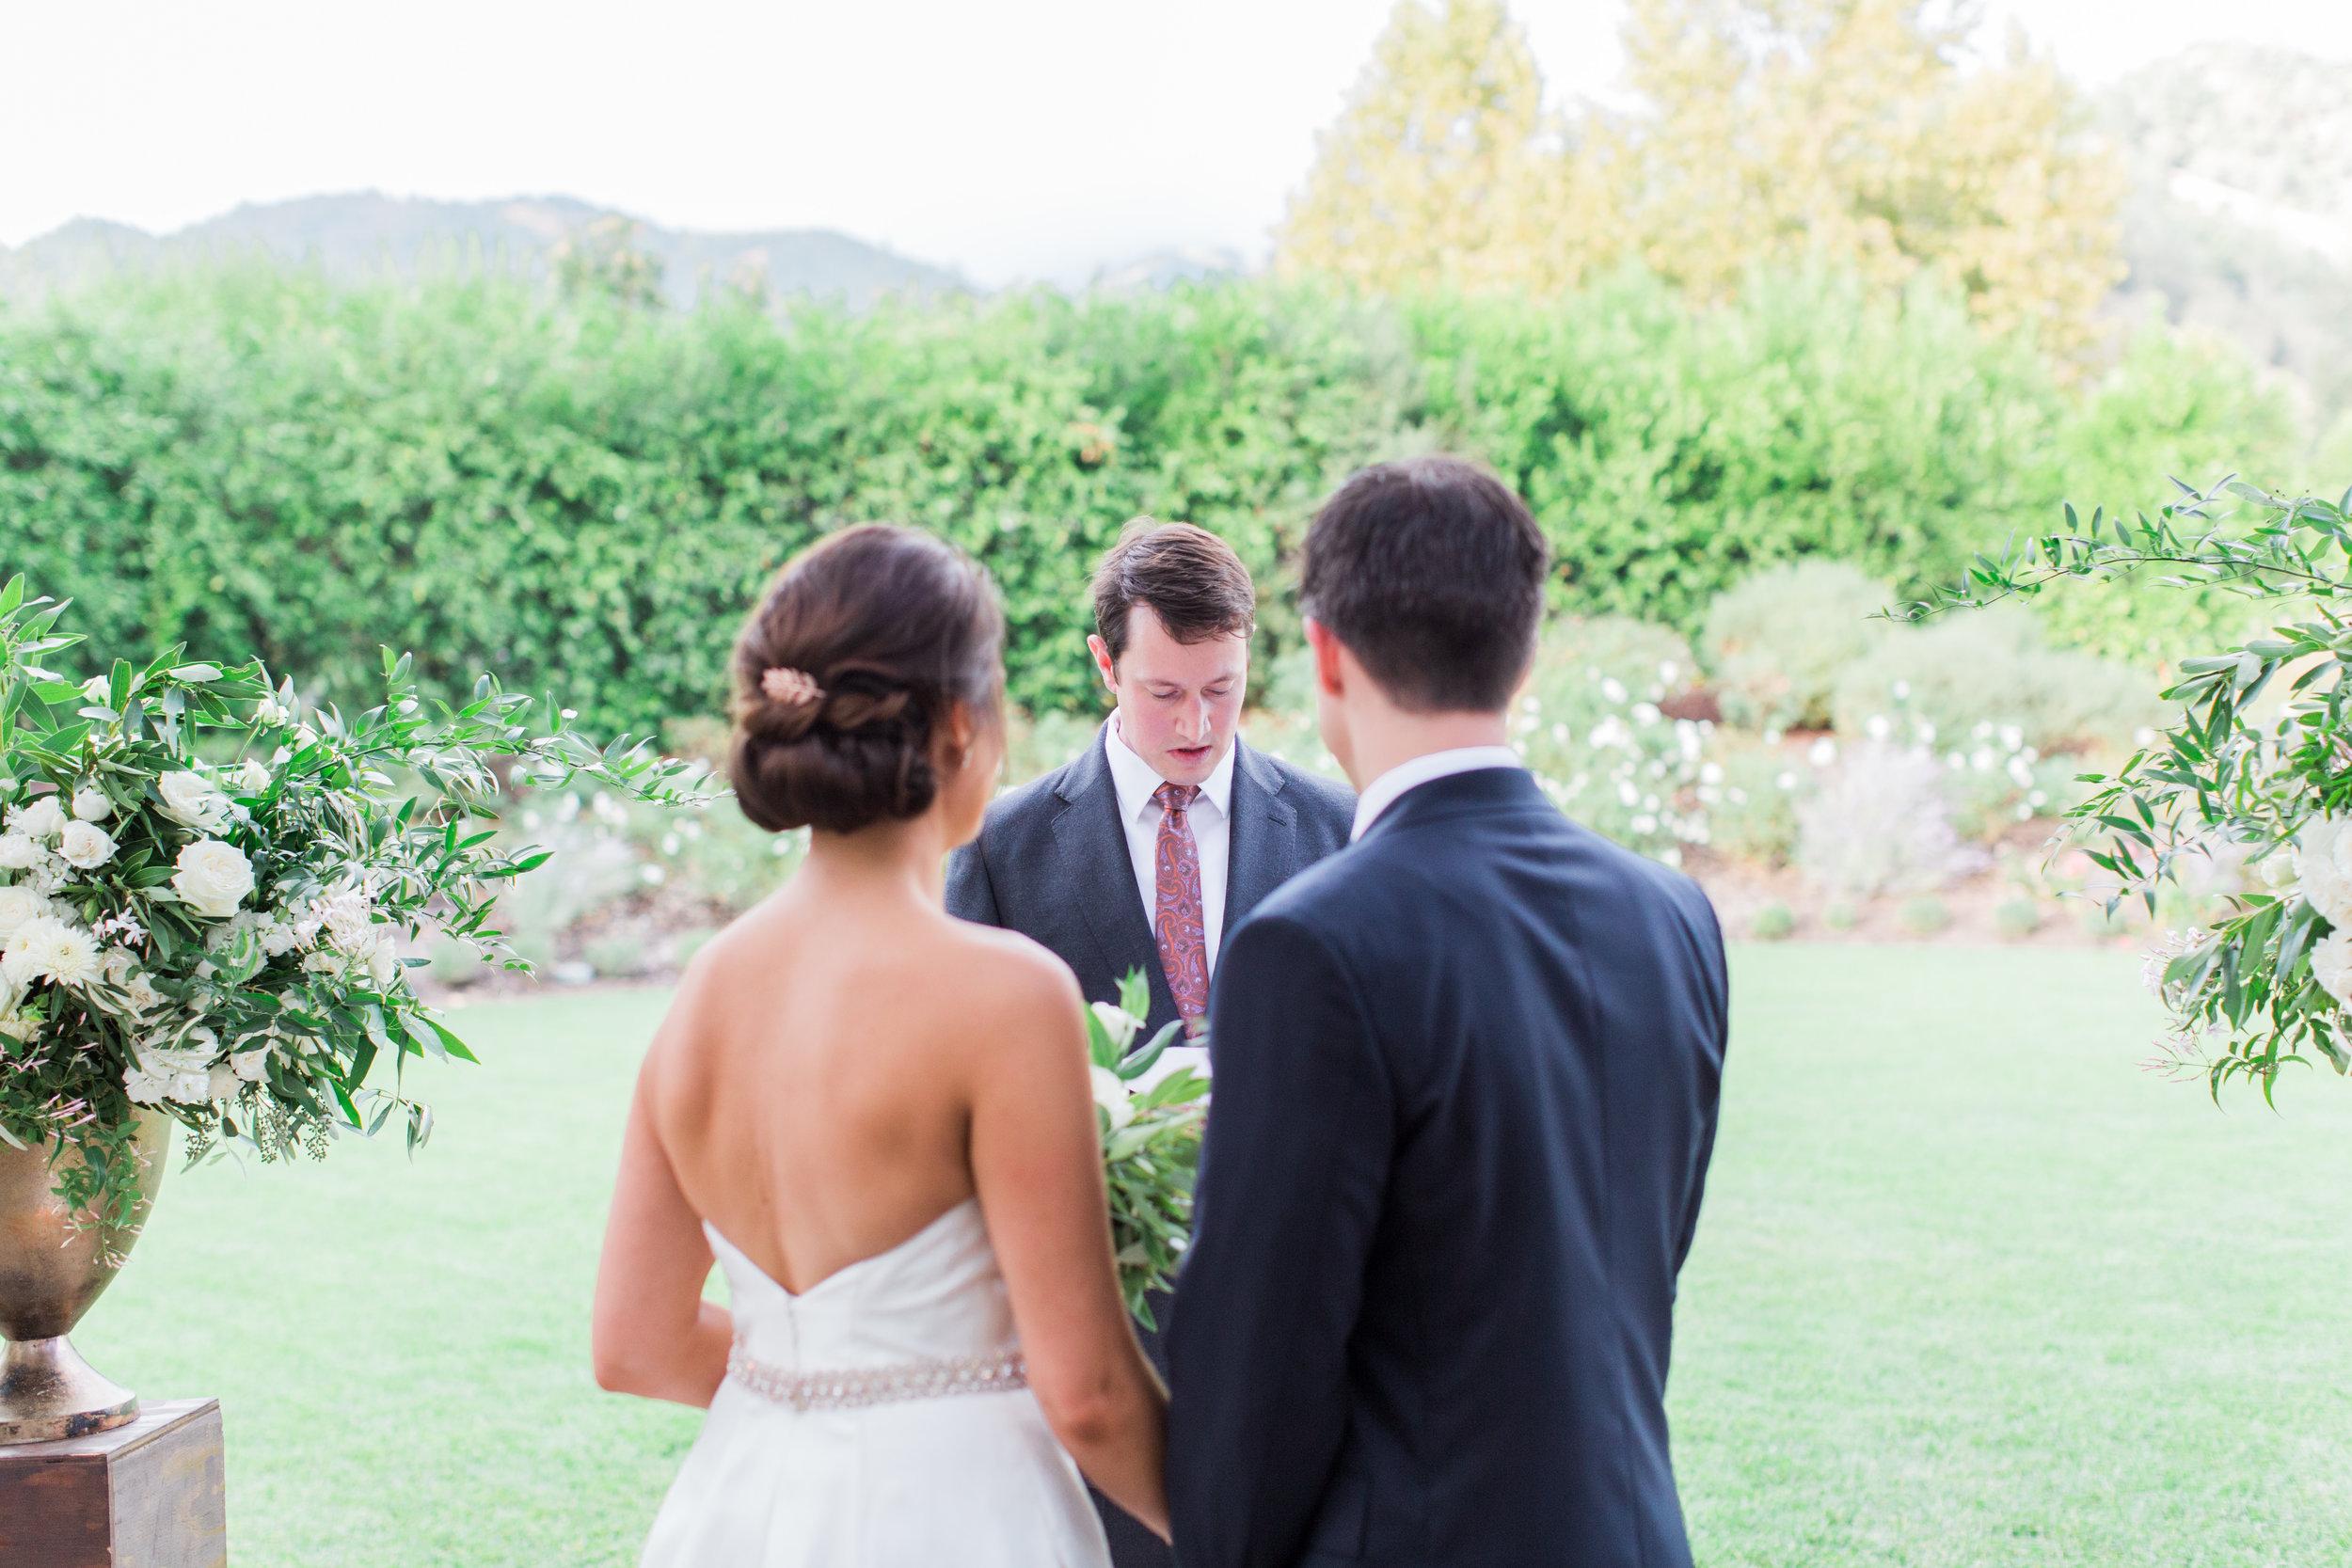 intimate-wedding-at-solage-calistoga-in-napa-64.jpg